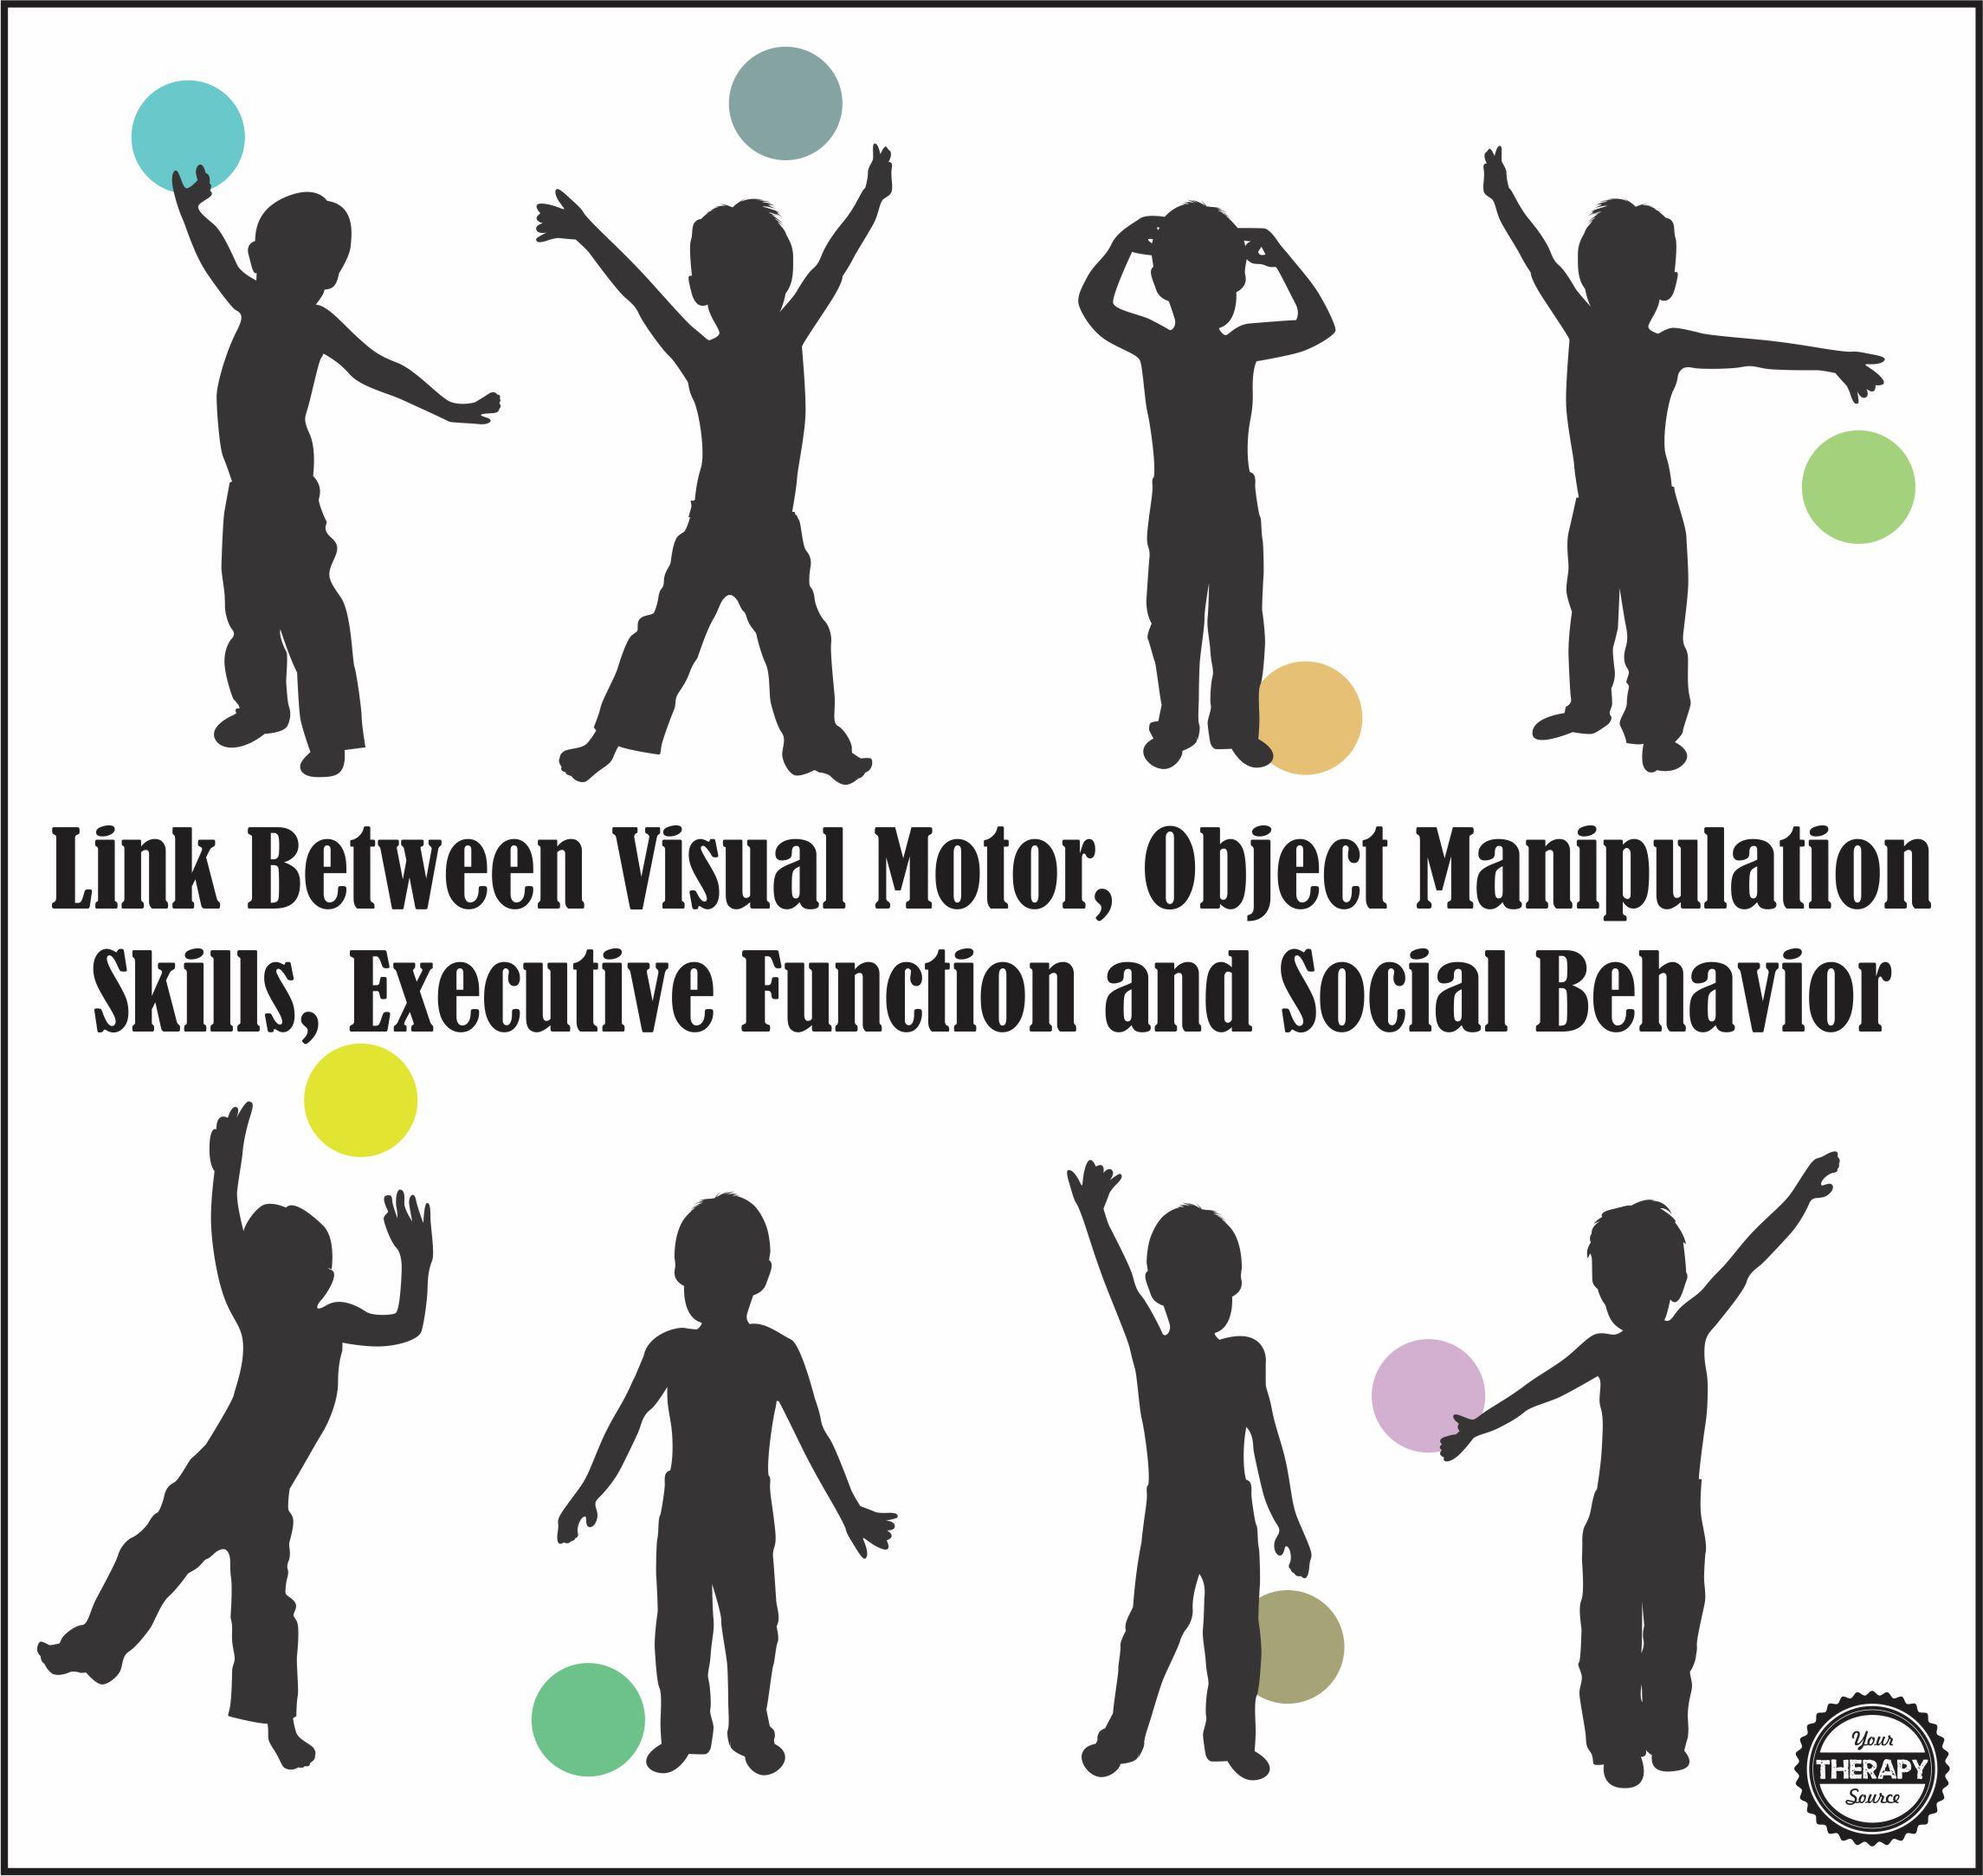 Link Between Visual Motor Object Manipulation Skills